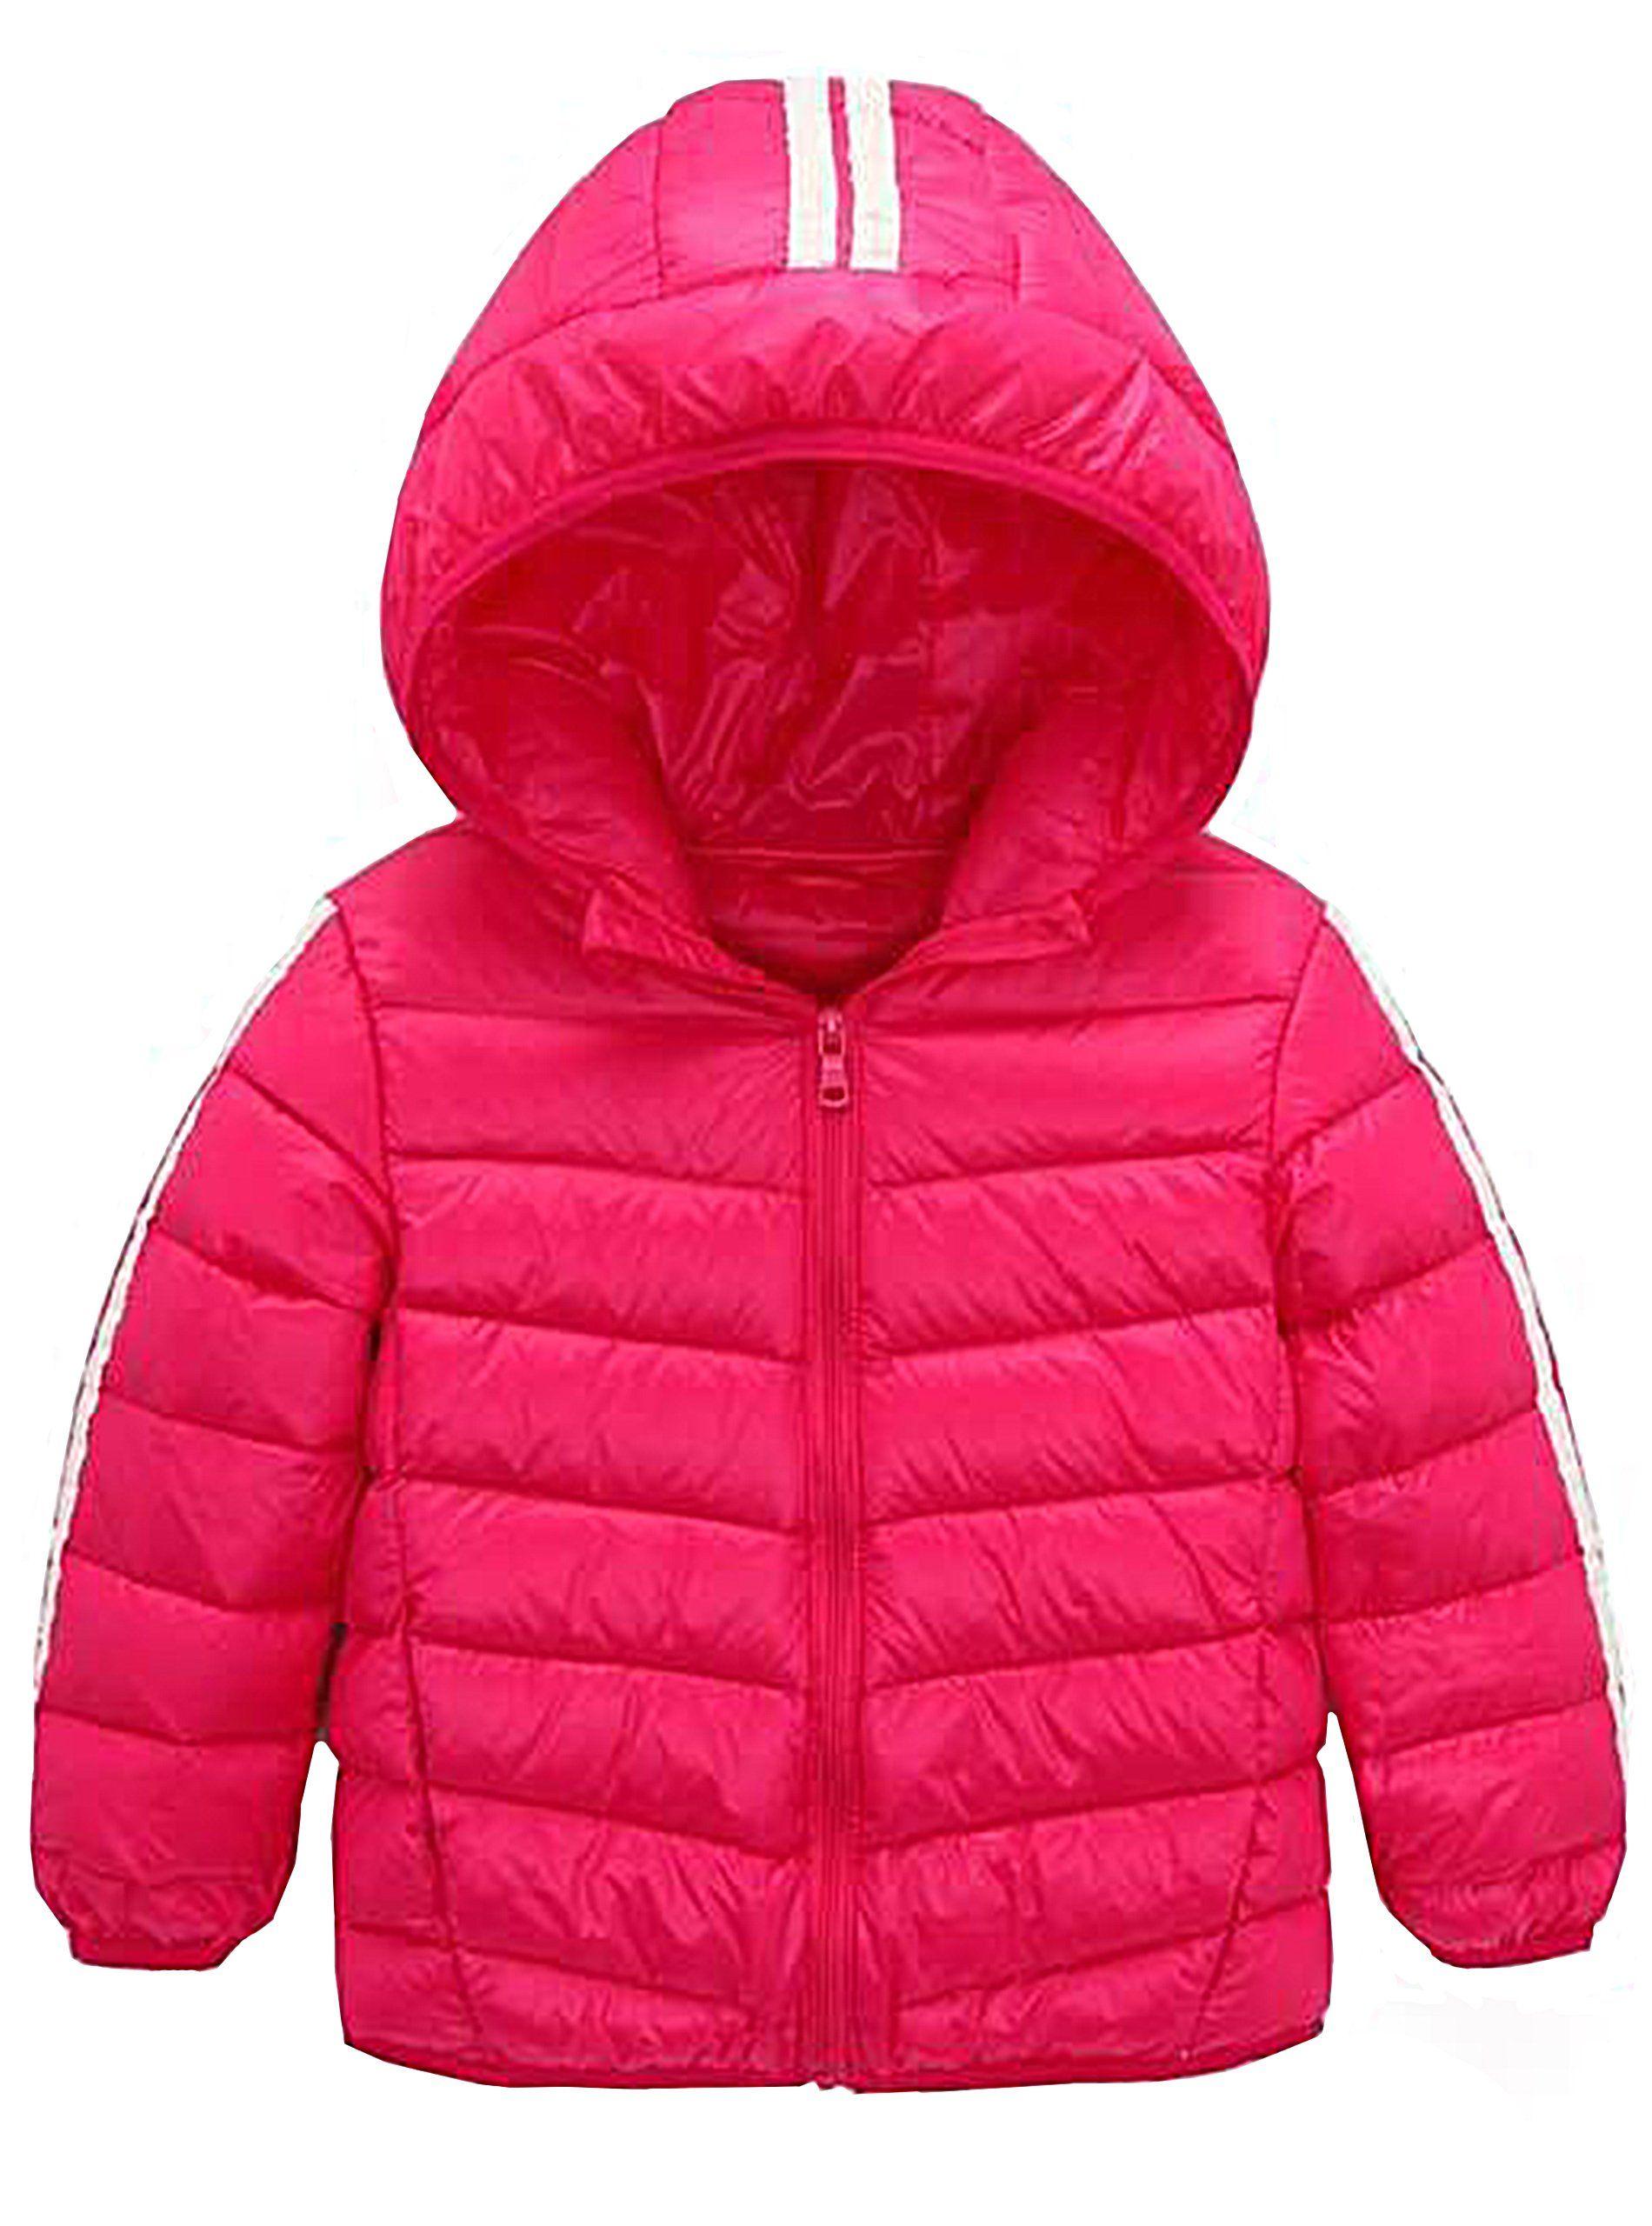 Capturelove Girls Lightweight Hooded Puffer Down Vests